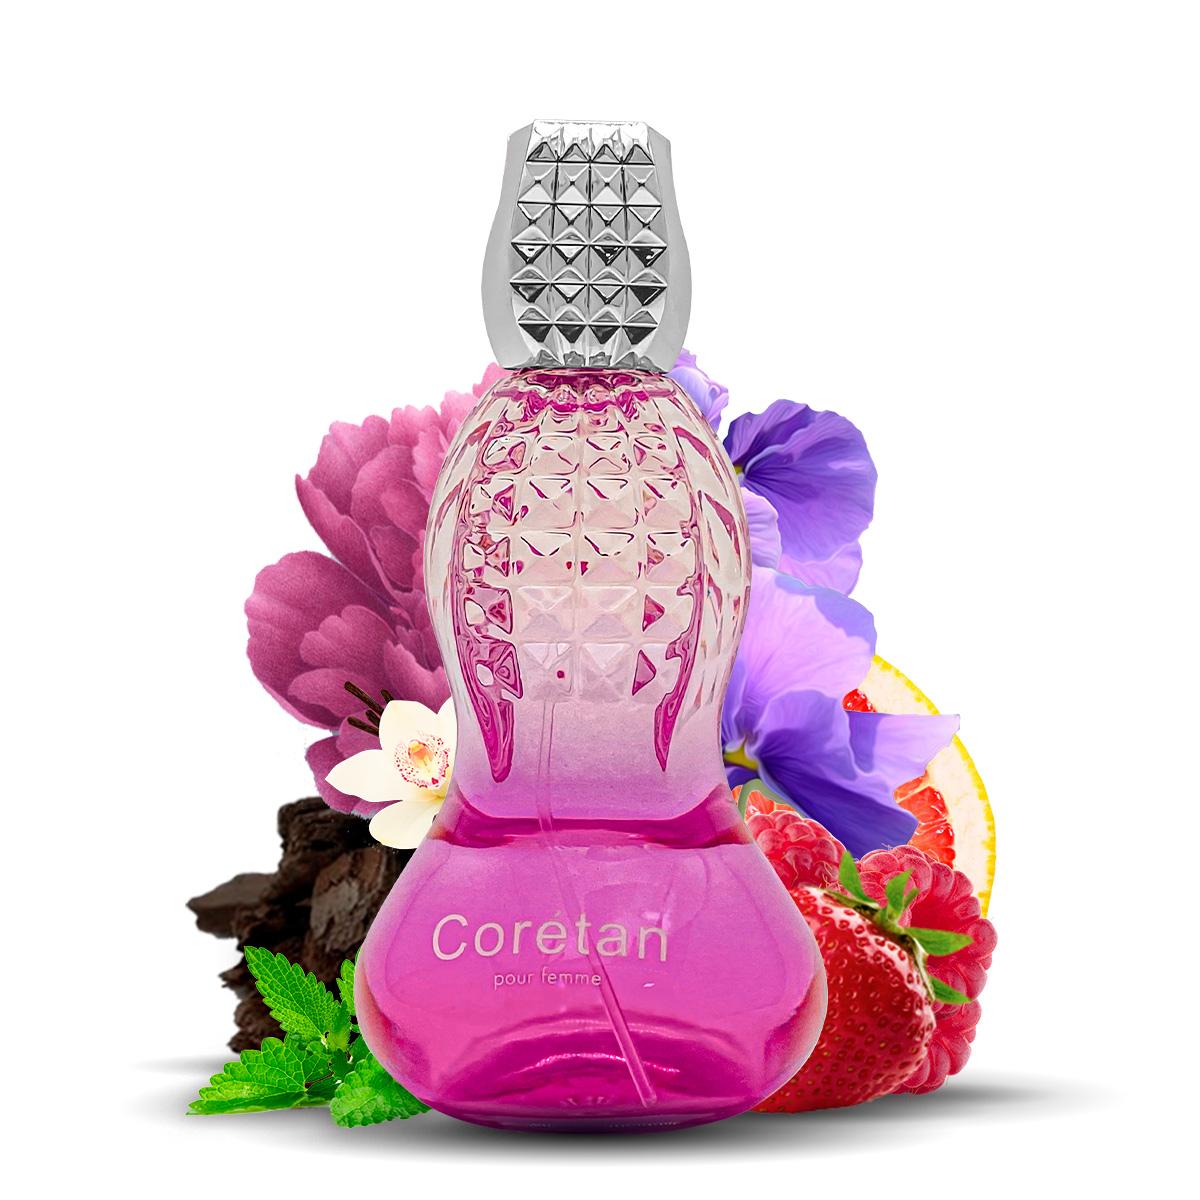 Kit 2 Perfumes Importados Coretan e Silver Spirit I Scents